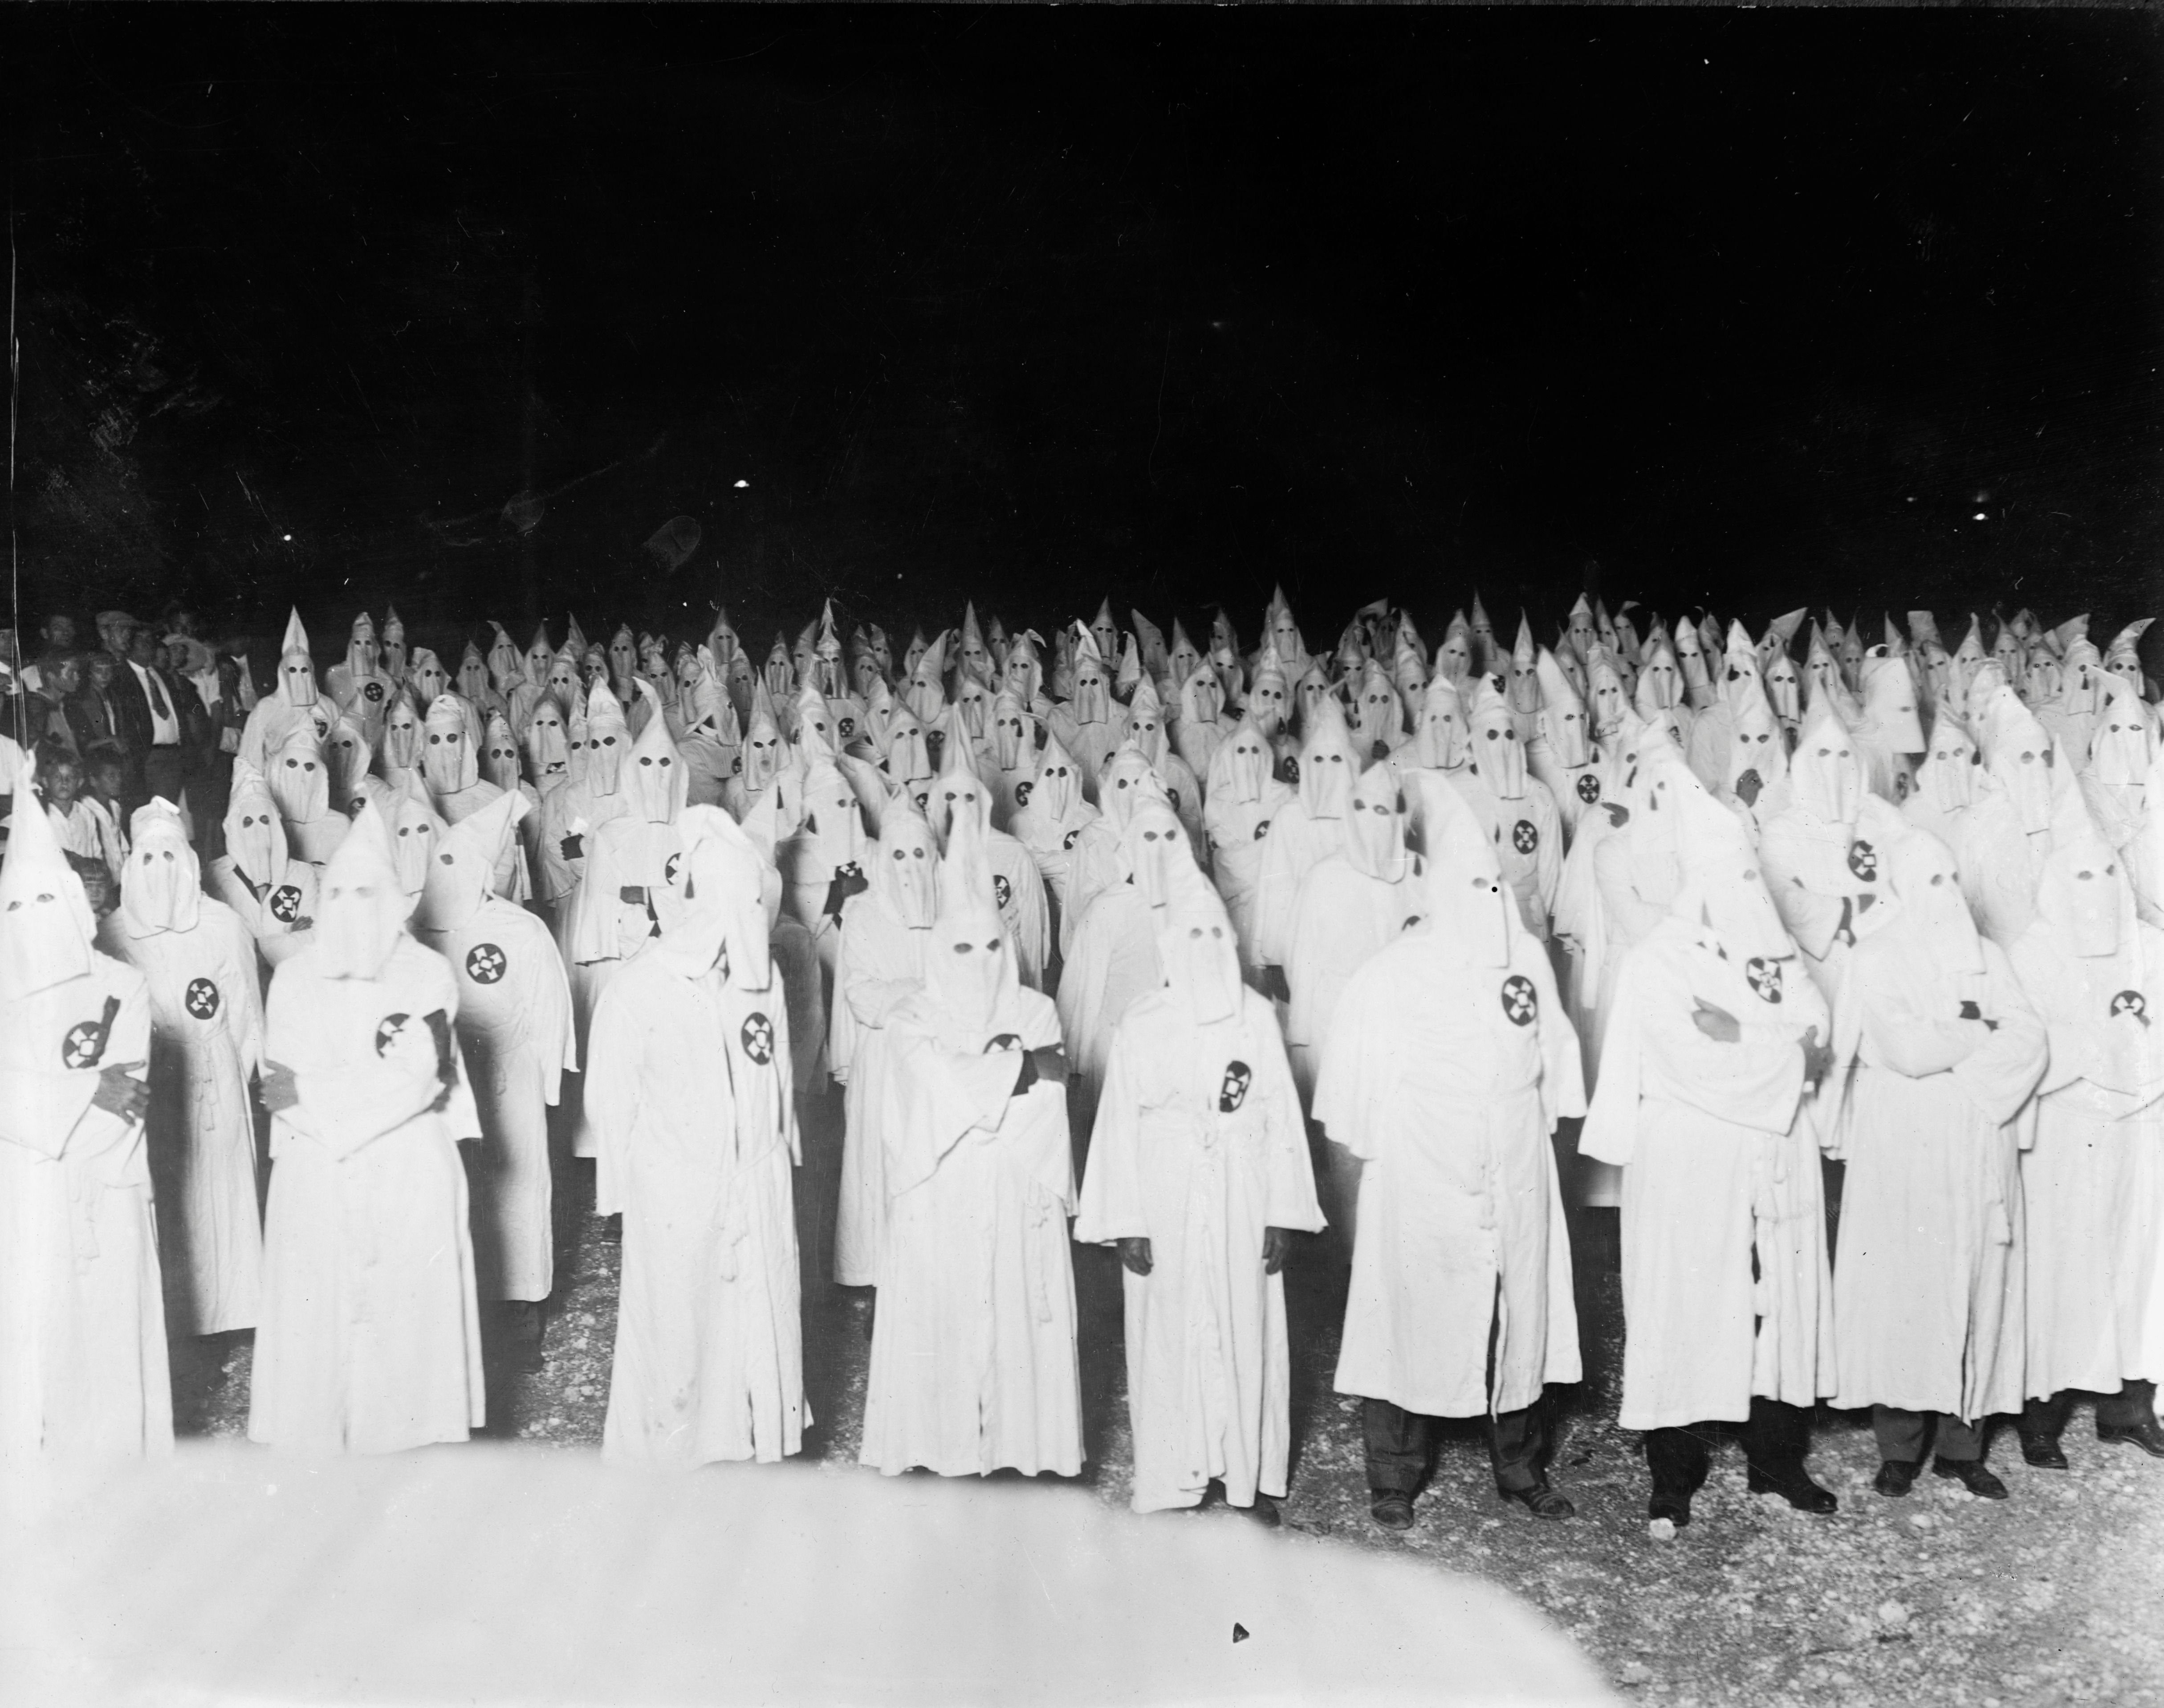 The Ku Klux Klan Was More Main...